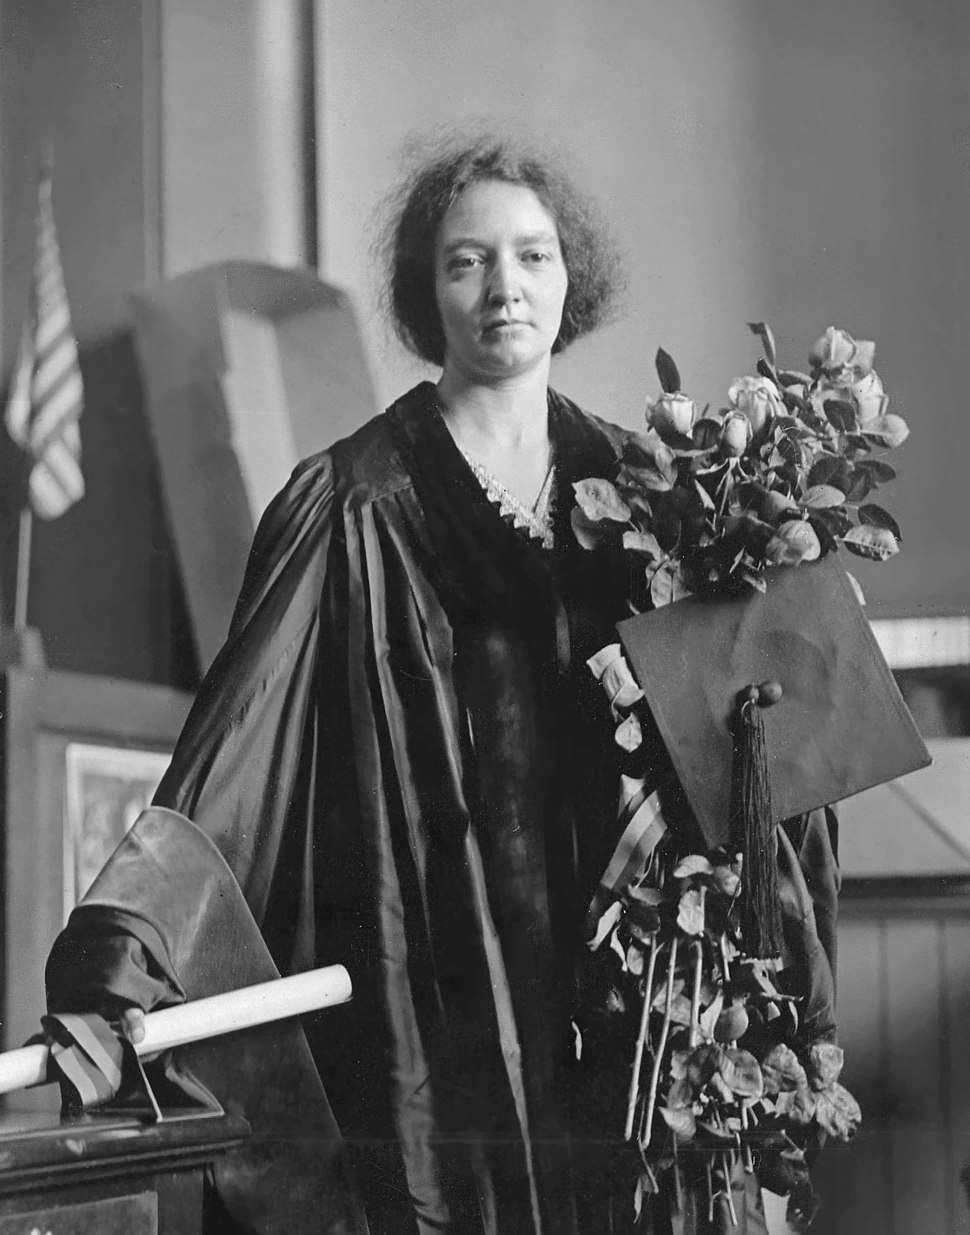 Irène Joliot-Curie (1897-1956), 1921crop